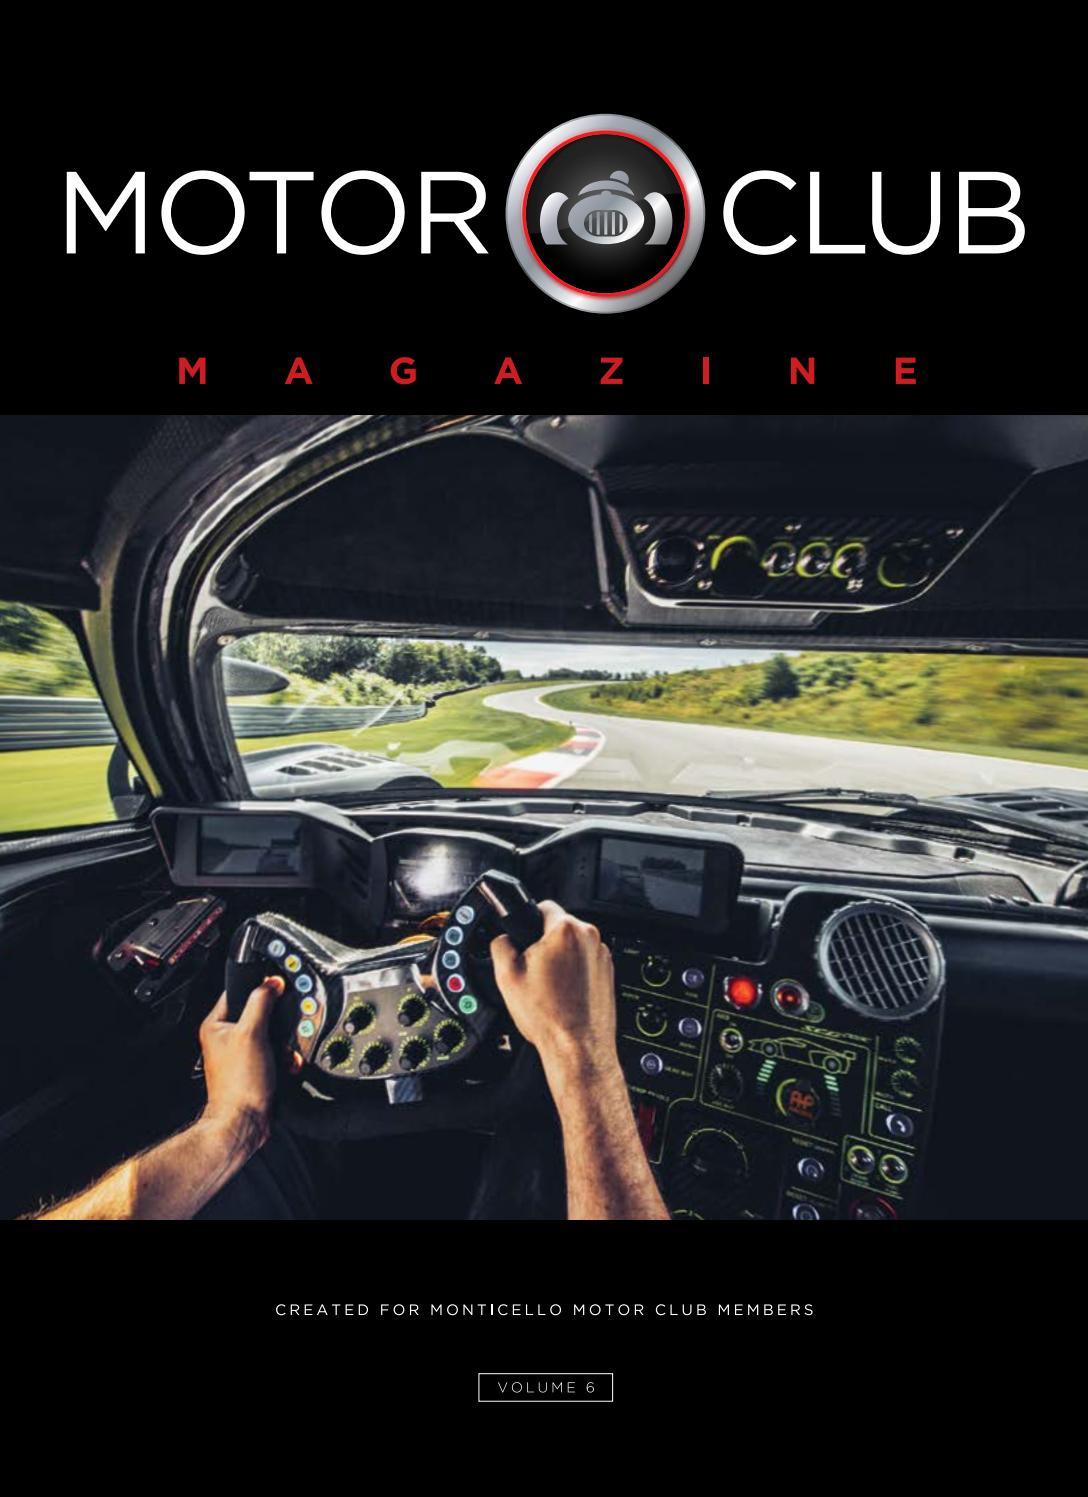 Motor Club Magazine Volume 6 By Monticello Motor Club